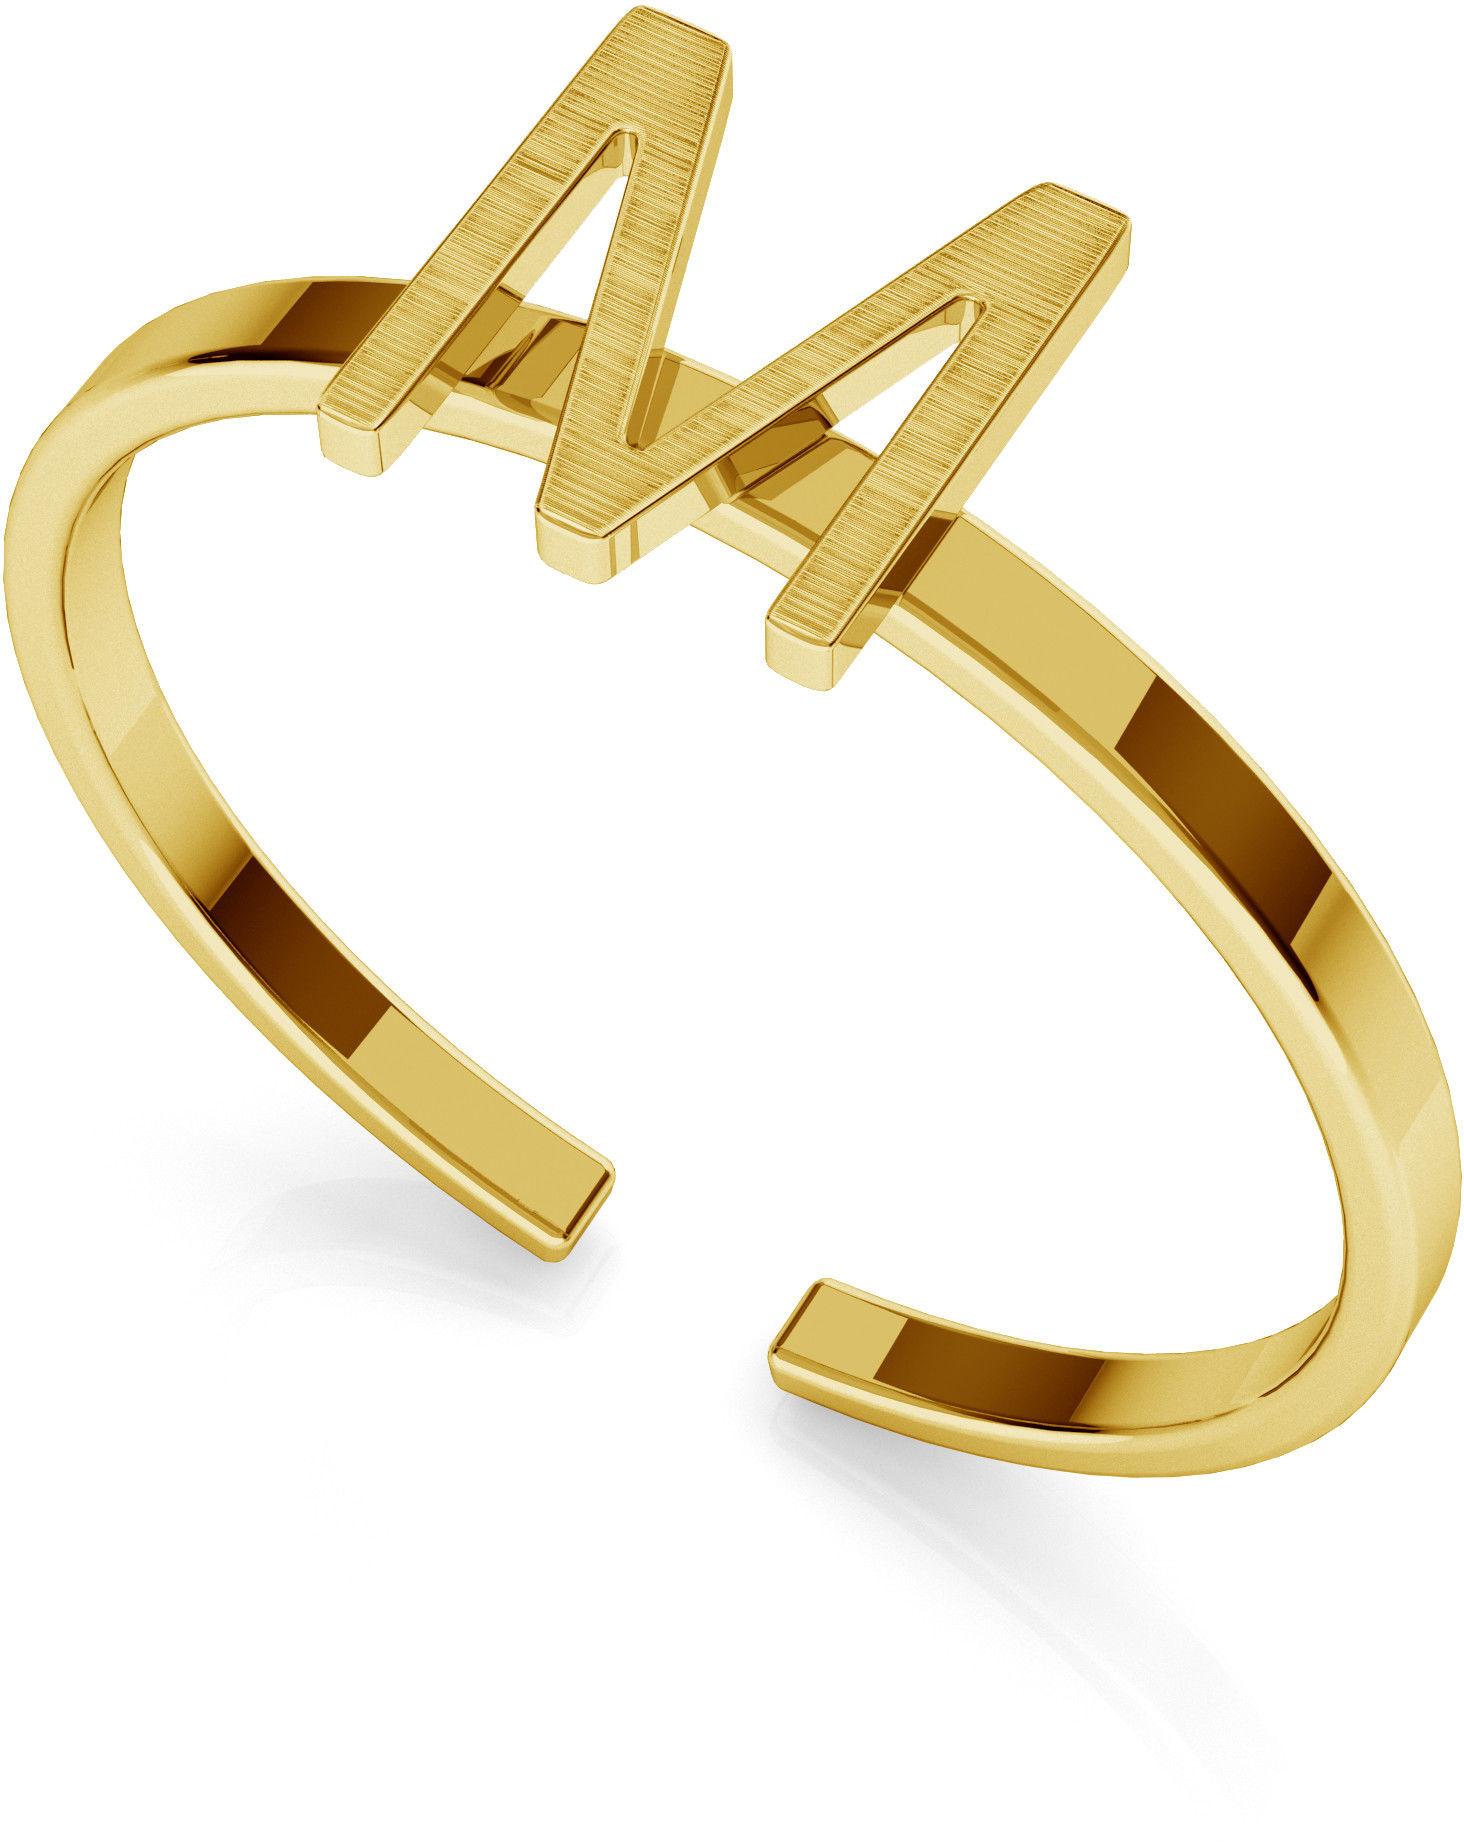 Srebrny pierścionek z literką My RING, srebro 925 : Litera - F, Srebro - kolor pokrycia - Pokrycie żółtym 18K złotem